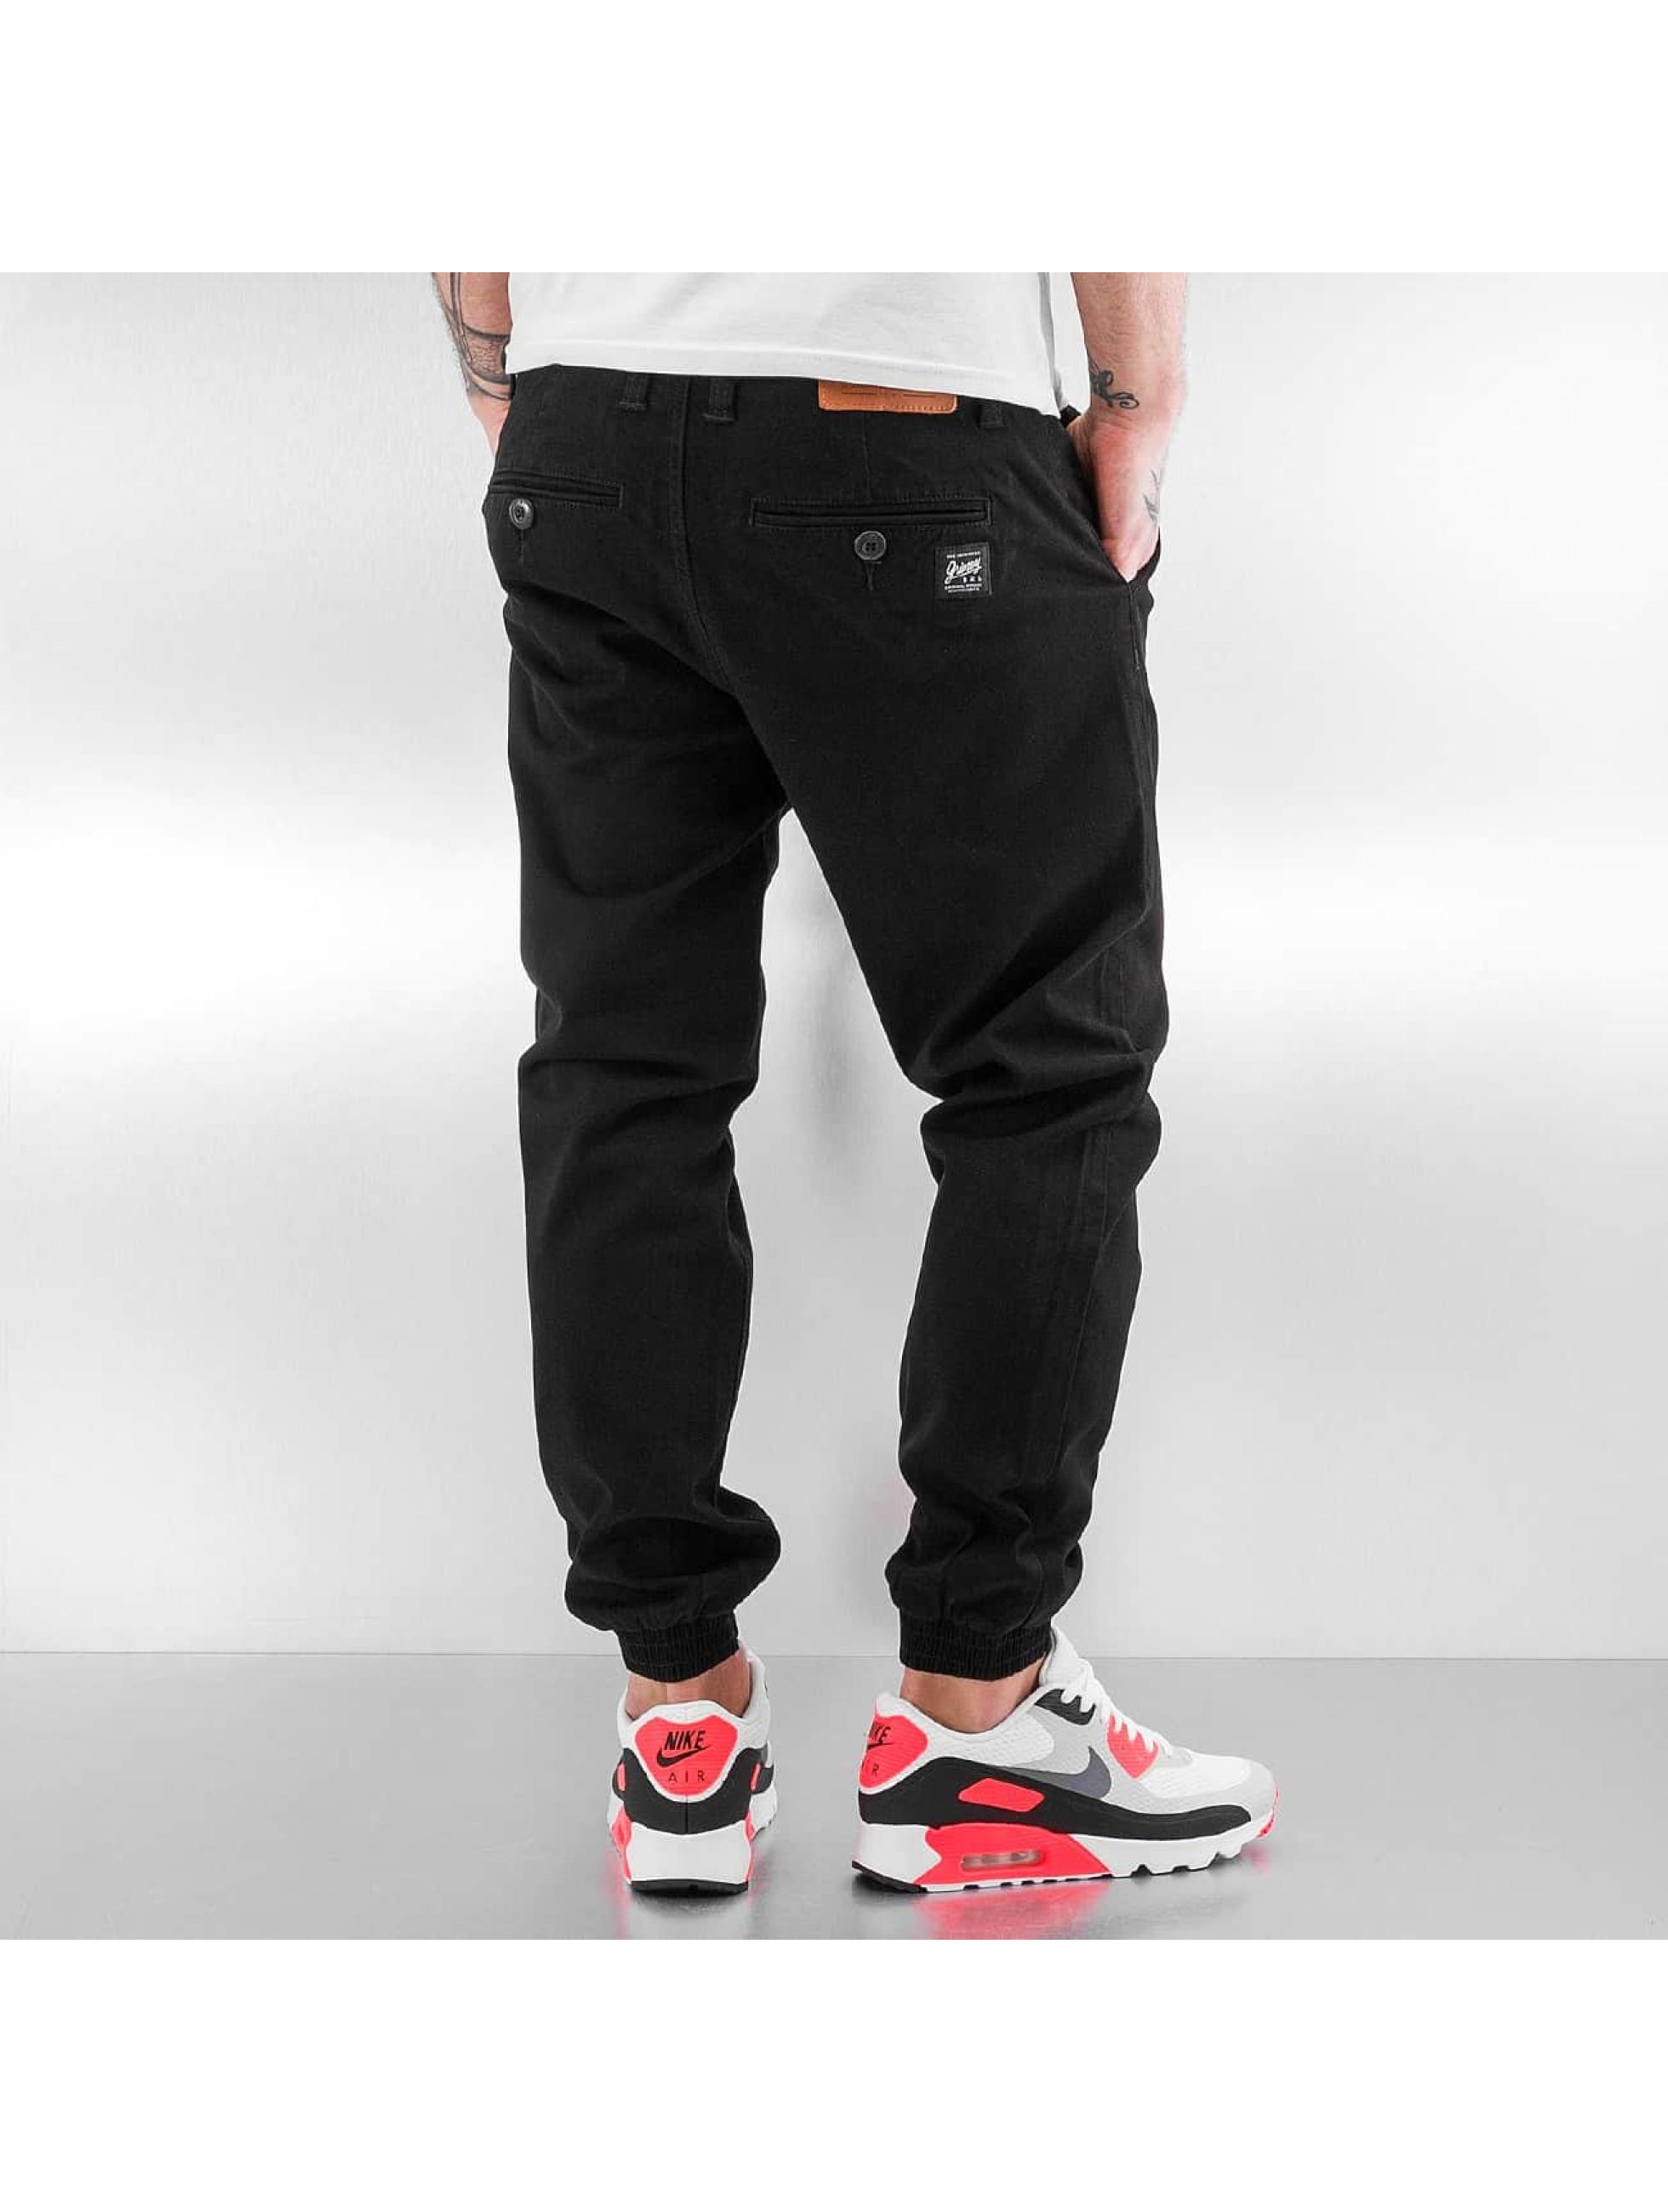 Grimey Wear Pantalón deportivo Twill Peach negro